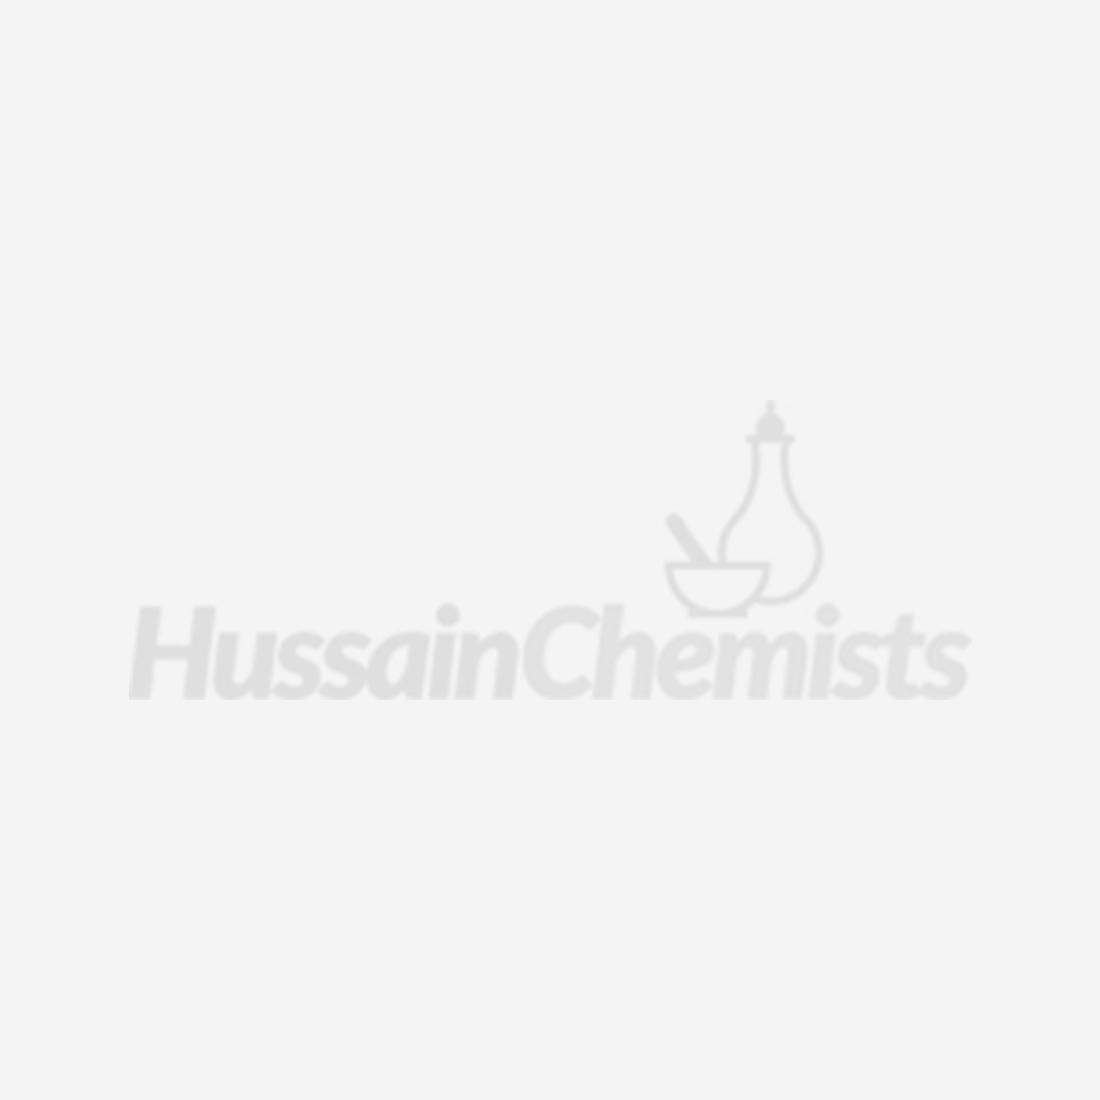 Sudocrem Antiseptic Healing Cream For Nappy Rash, Eczema, Burns and more - 250g